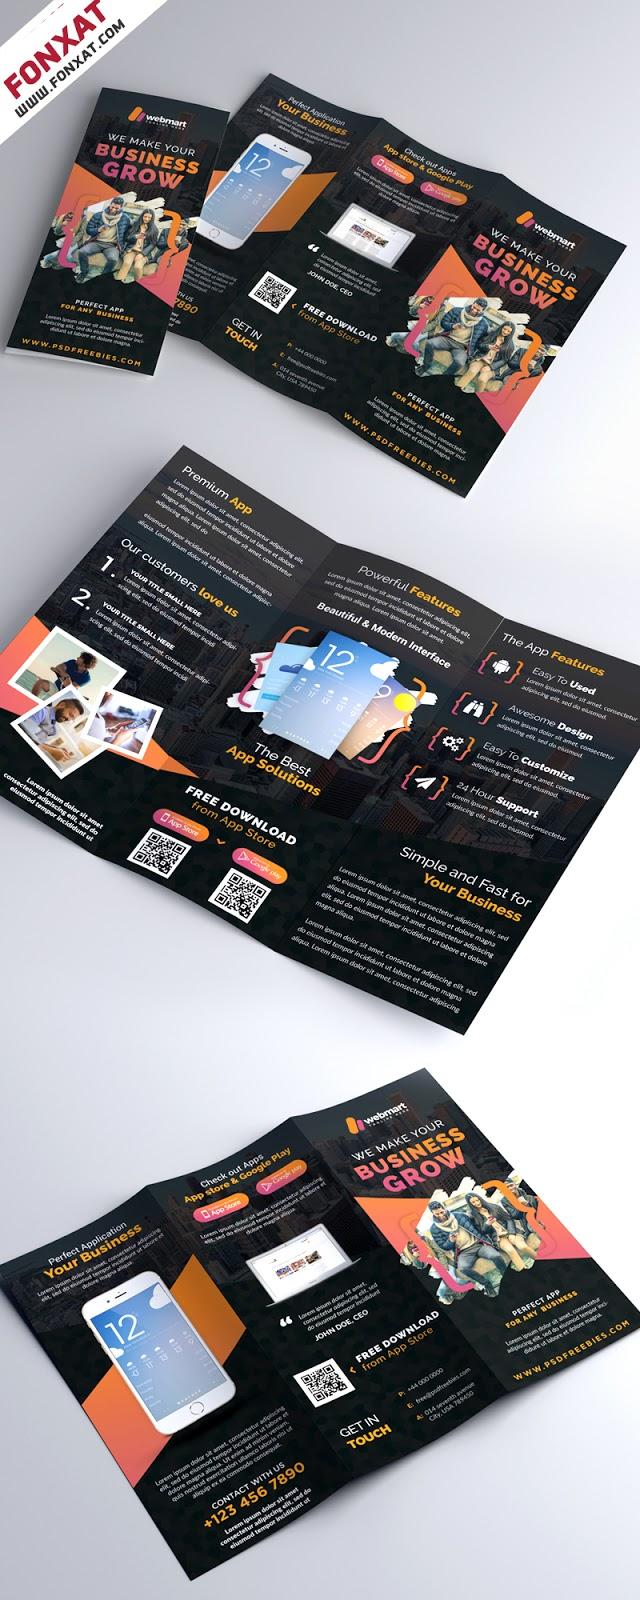 Mobile-App-Promotion-Tri-Fold-Brochure-PSD